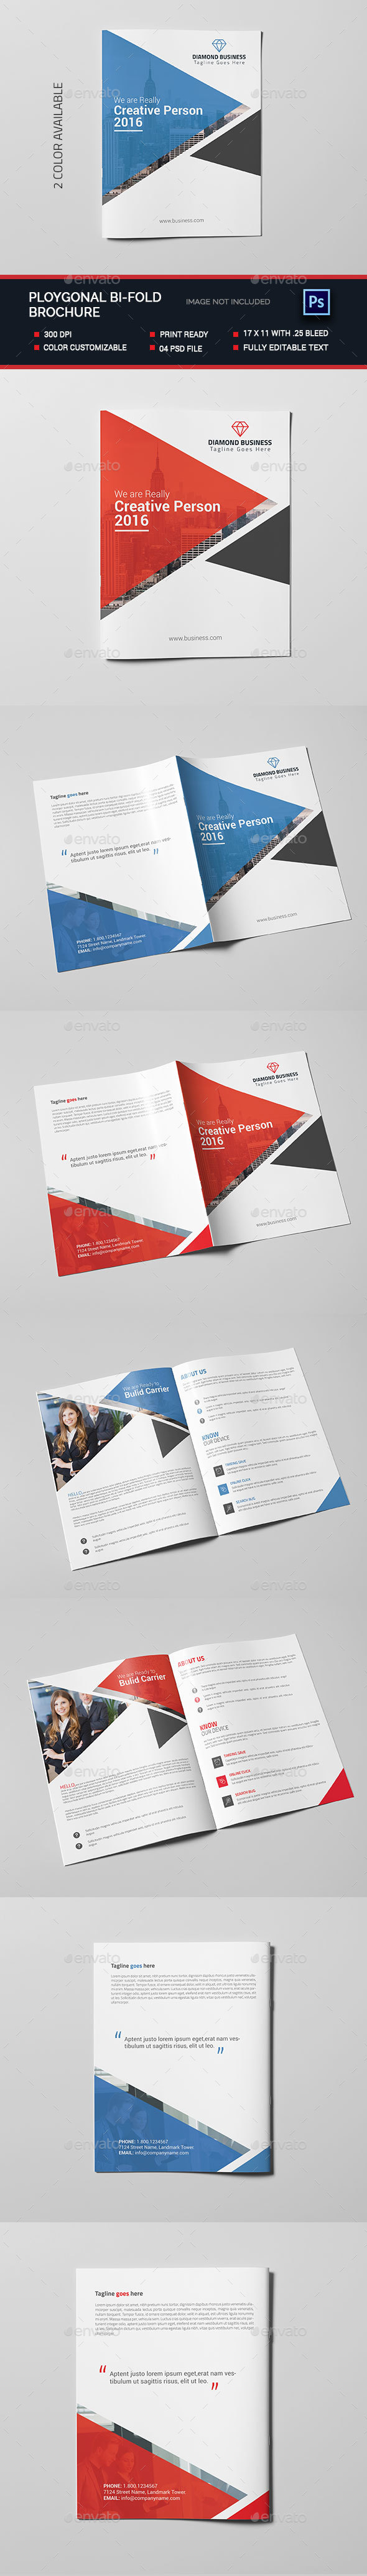 Polygonal Bi-fold Brochure - Brochures Print Templates